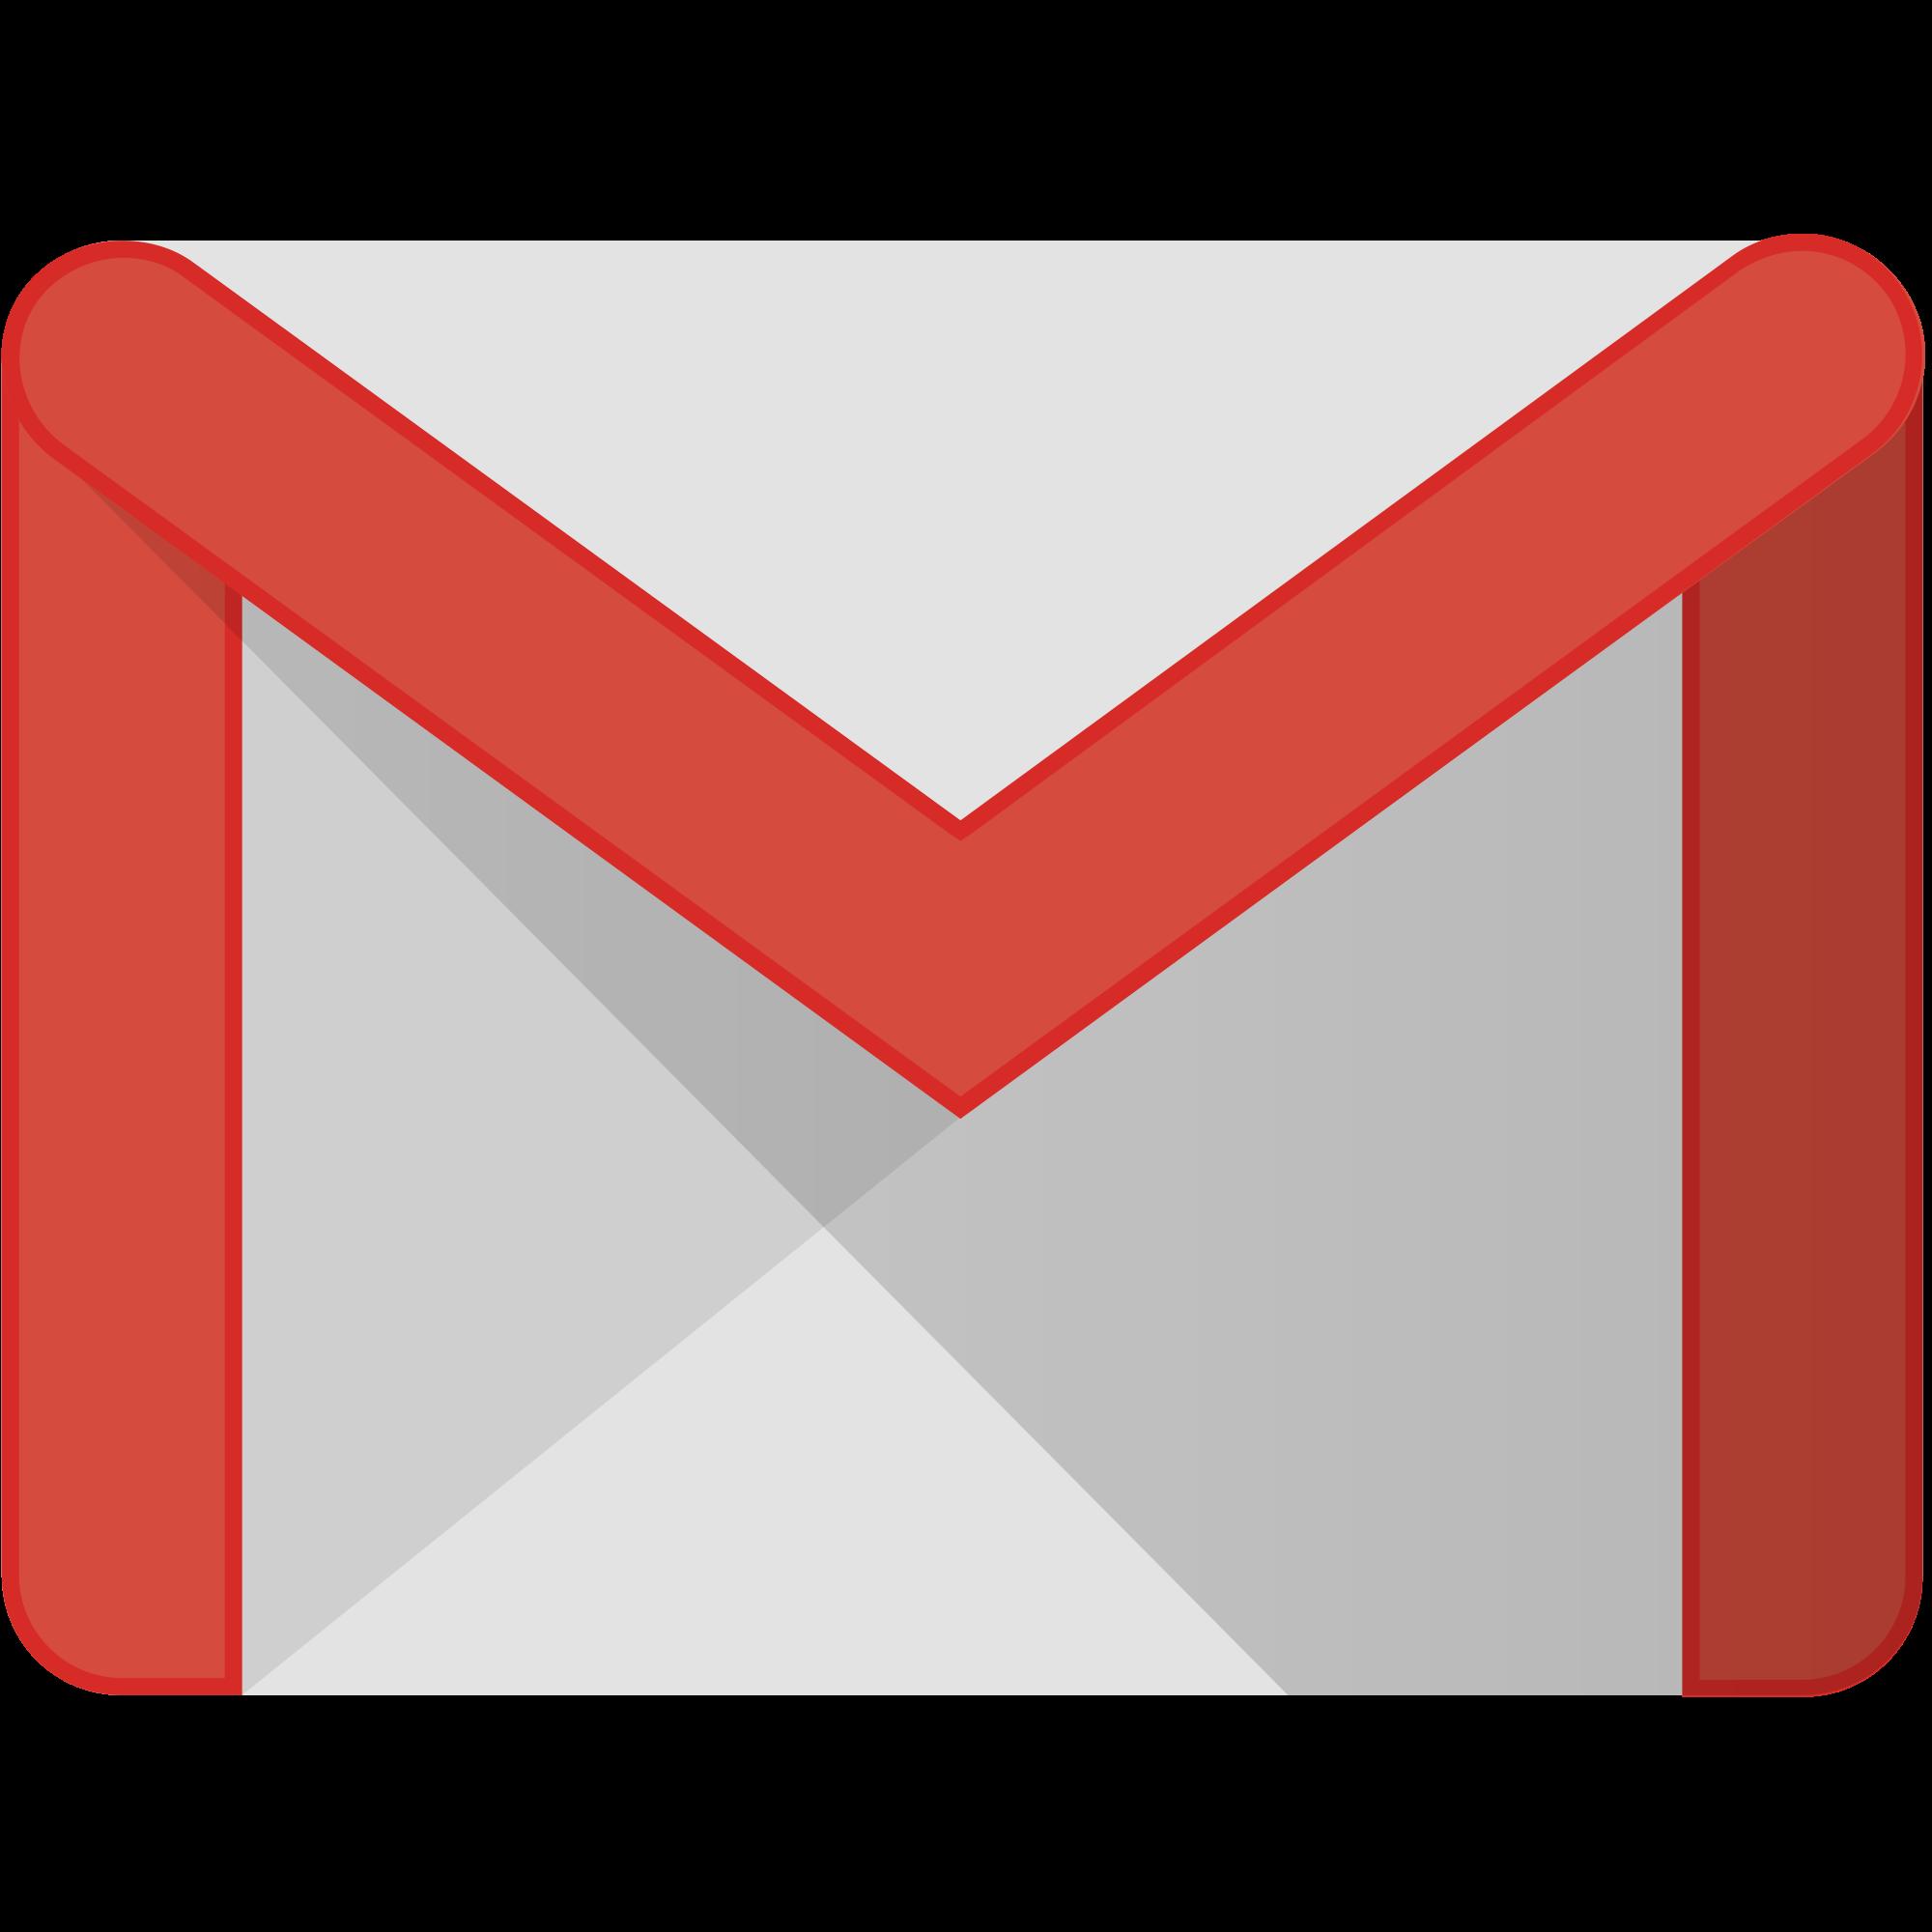 Gmail, logo, čtverec